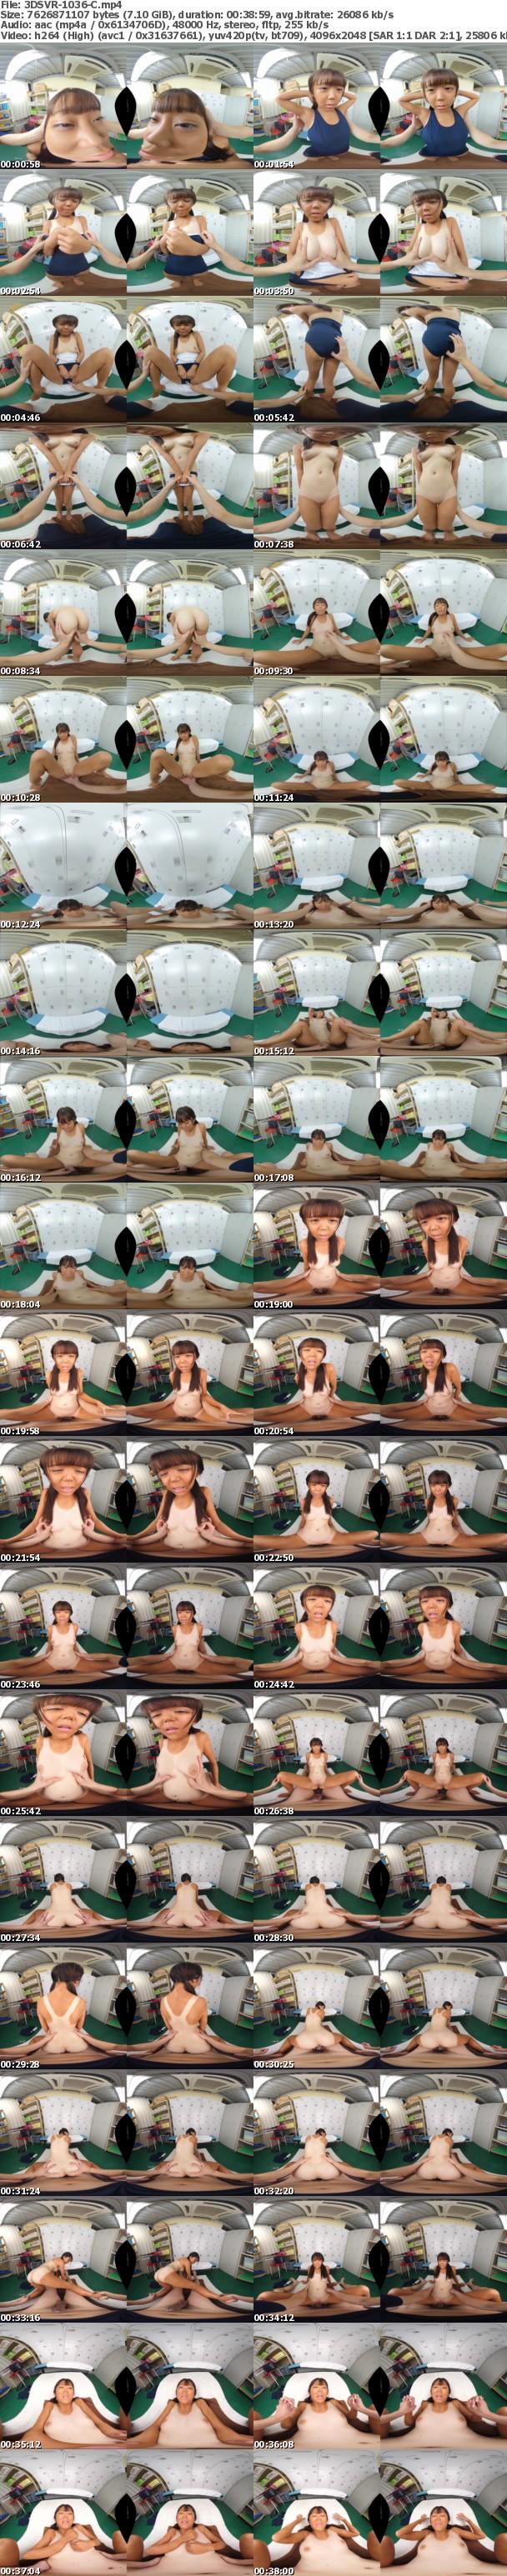 (VR) 3DSVR-1036 プールの後の更衣室。日焼けした女の子とわいせつ